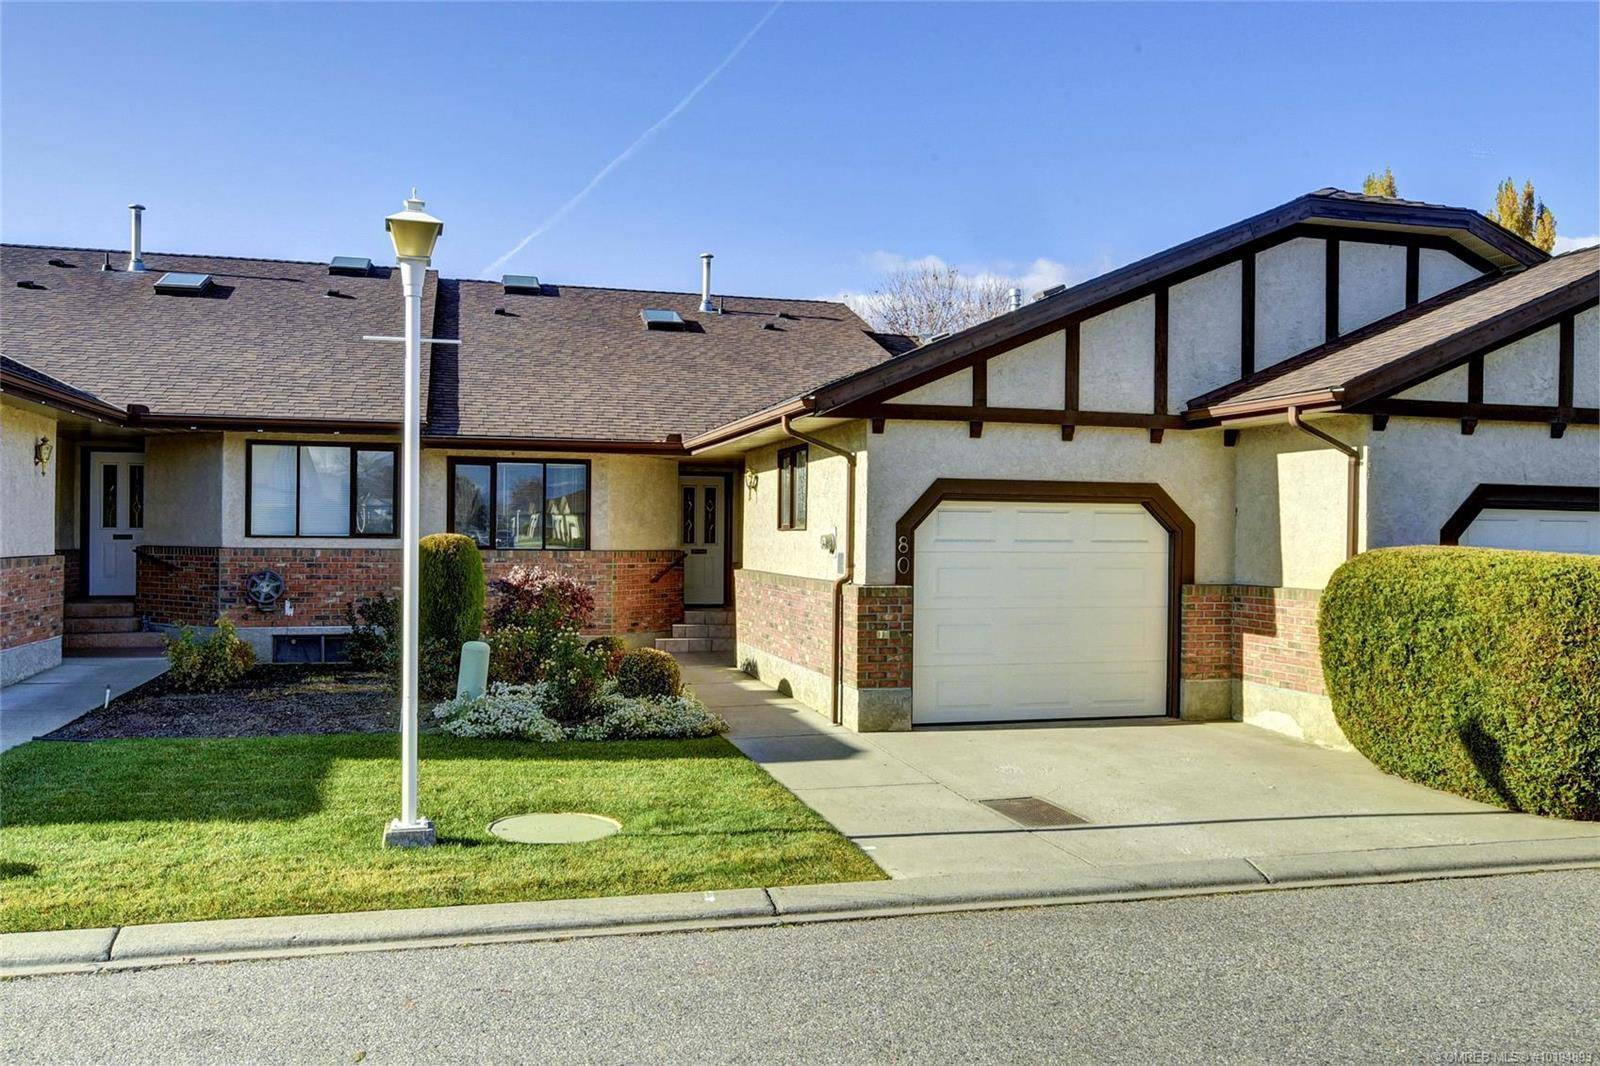 Townhouse for sale at 2200 Gordon Dr Unit 80 Kelowna British Columbia - MLS: 10194893